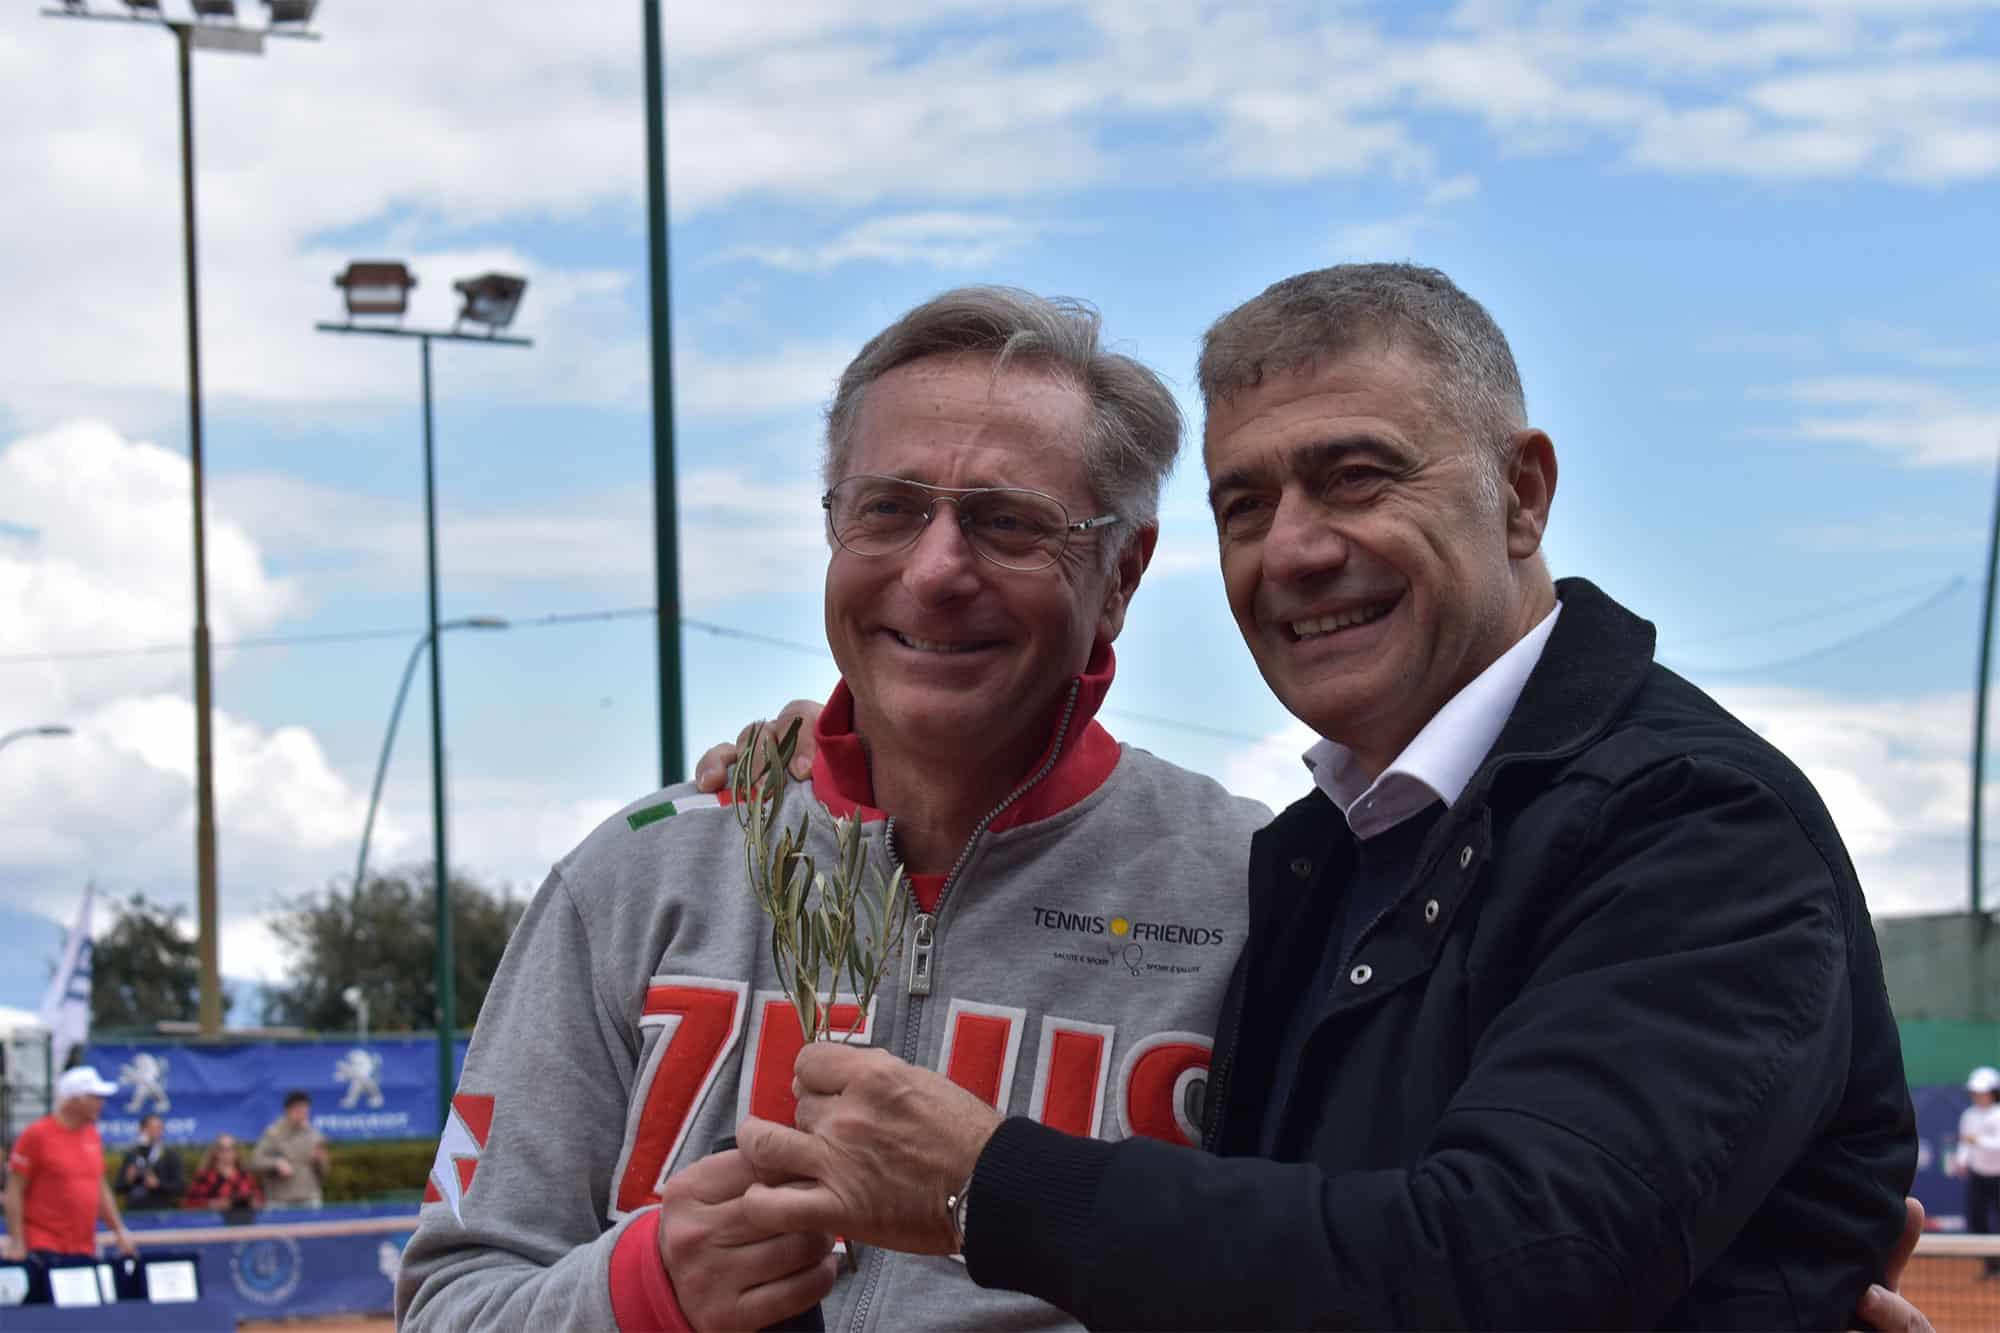 informare-tennis-and-friends